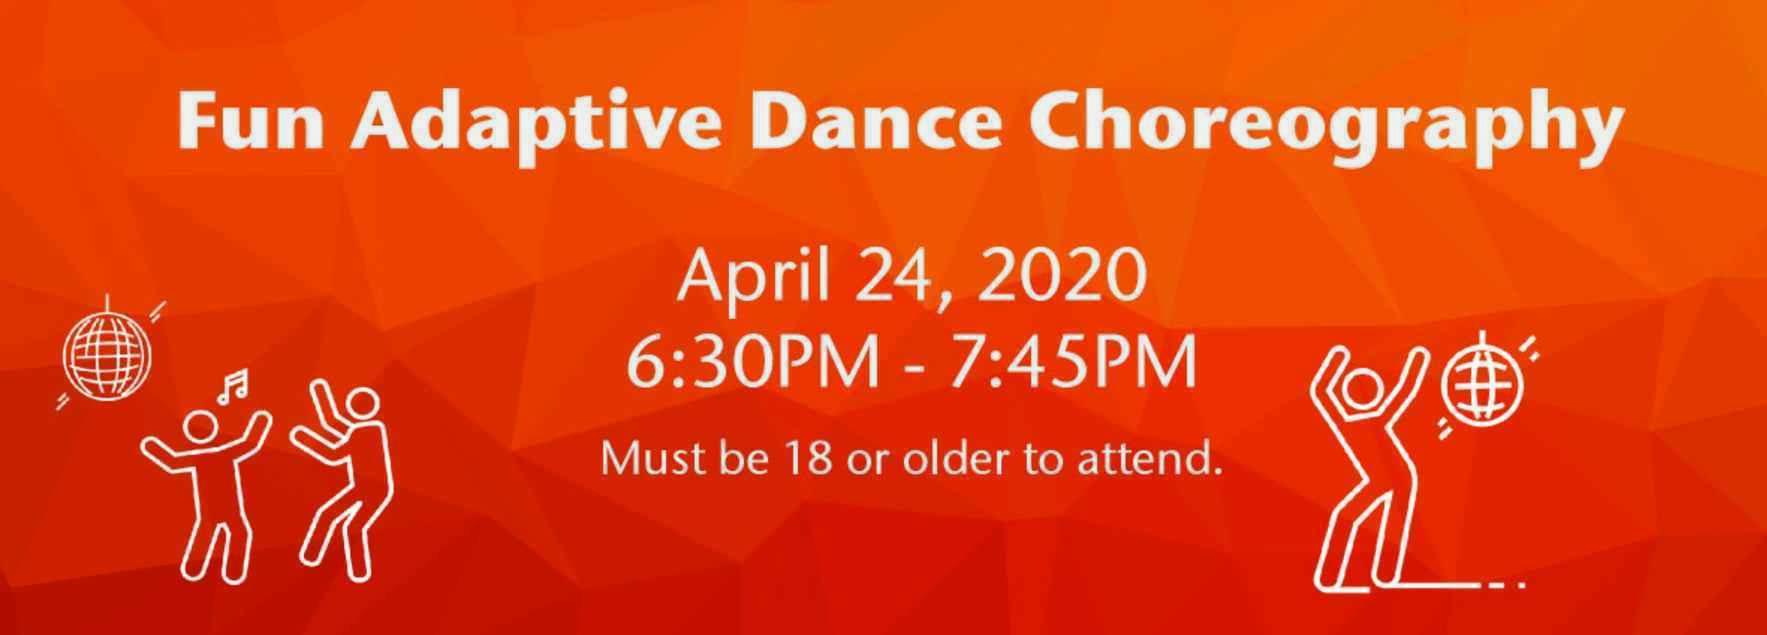 Fun Adaptive Dance Choreography  image